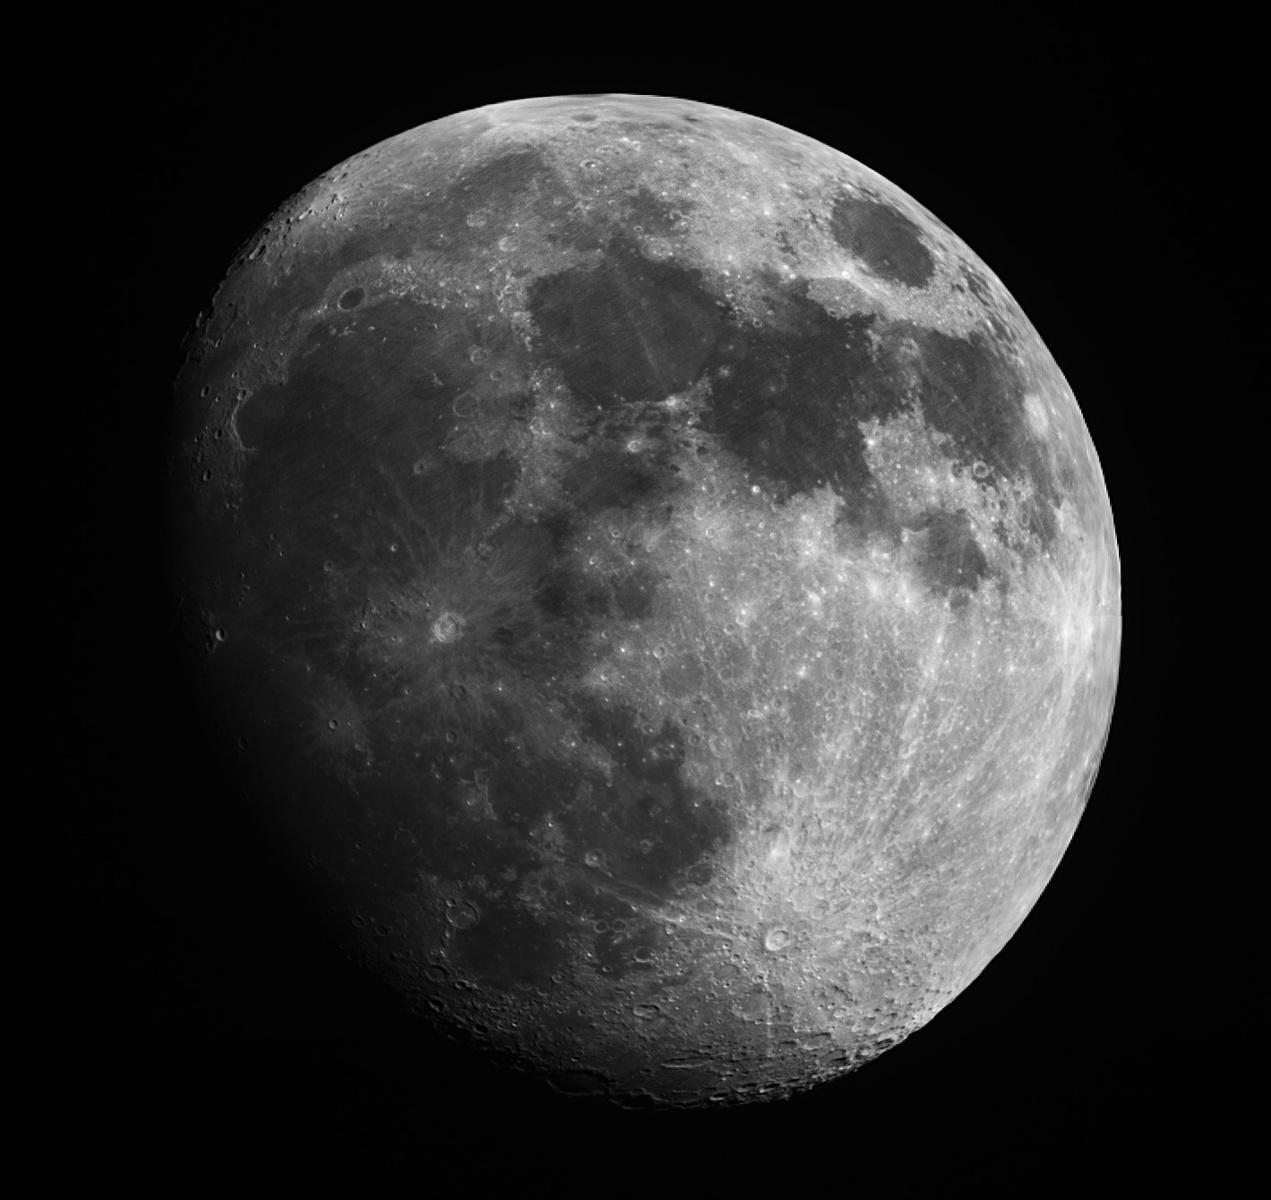 Moon.thumb.jpg.97b6f419ab6359919bb09a8af3d56ac8.jpg